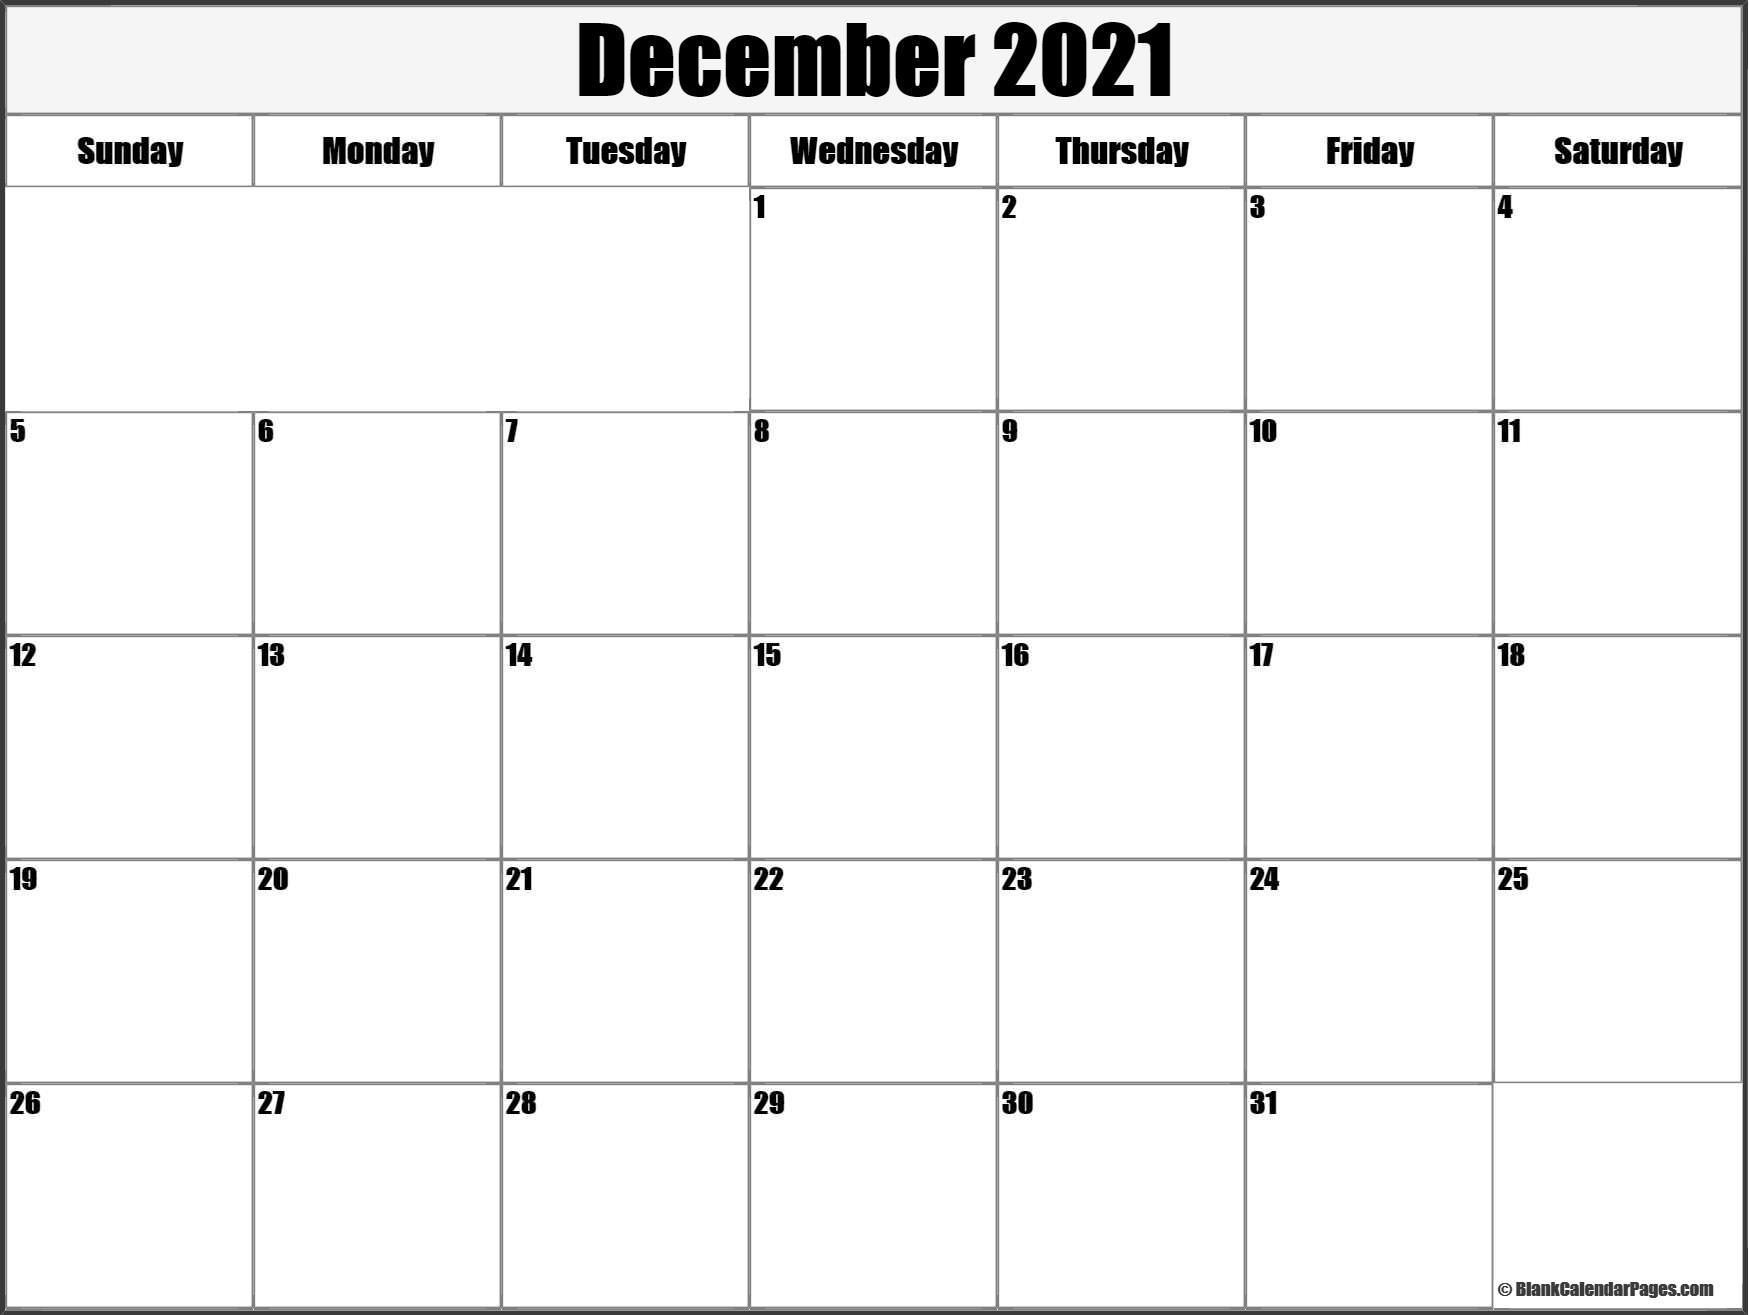 December 2021 Blank Calendar Templates